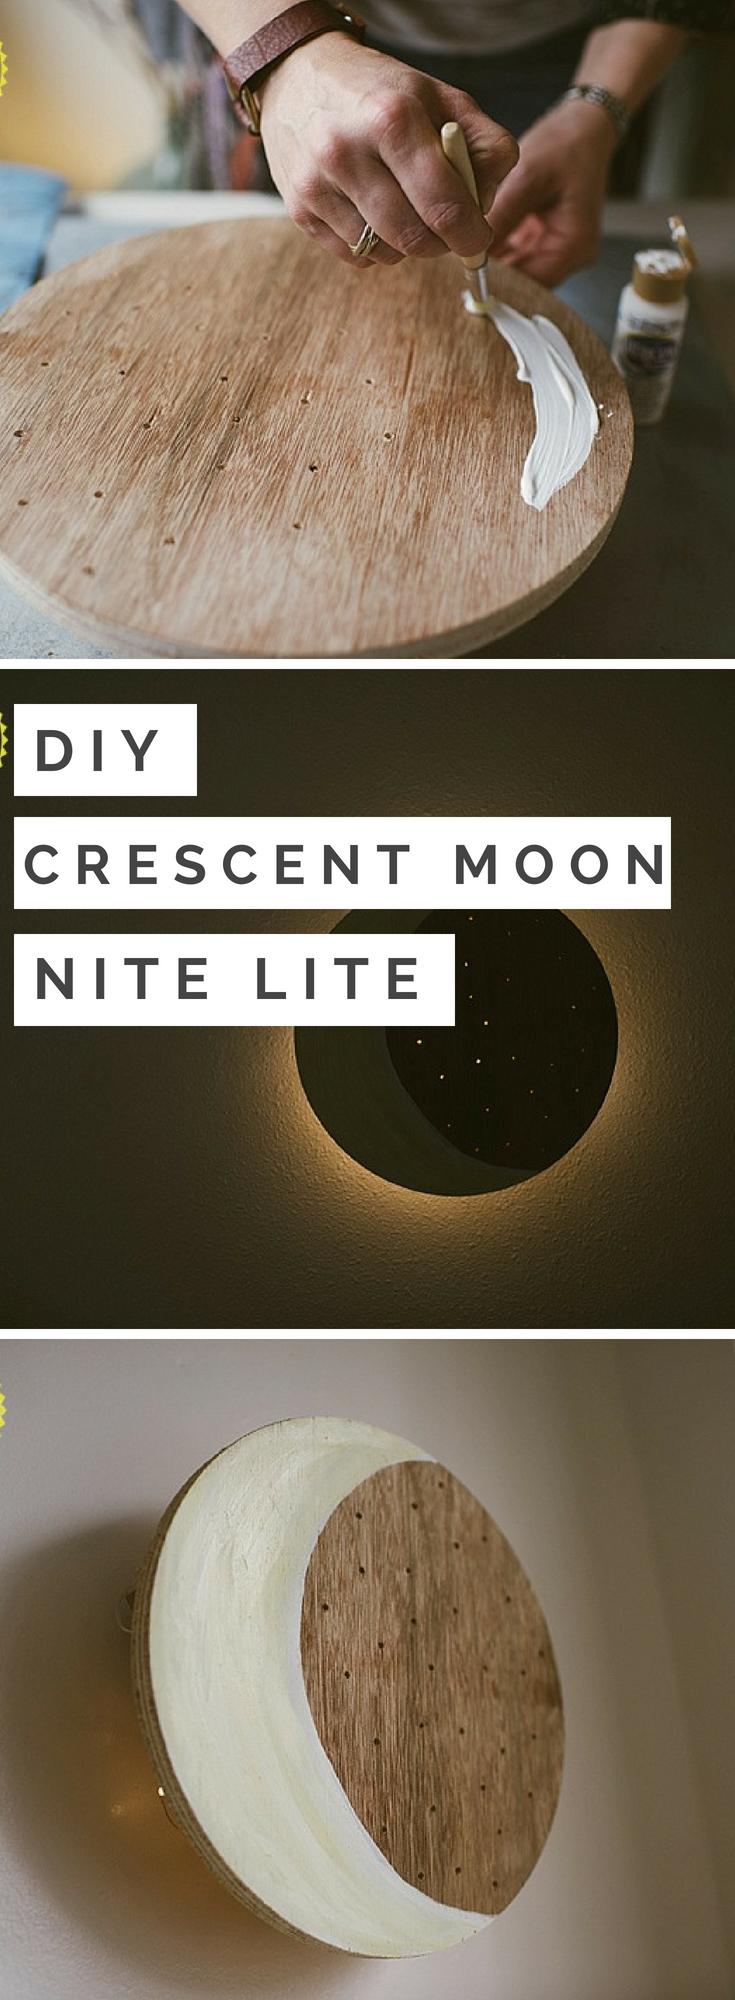 Diy Crescent Moon Night Light Diy Nursery Decor Wood Crafts Diy Nursery Crafts